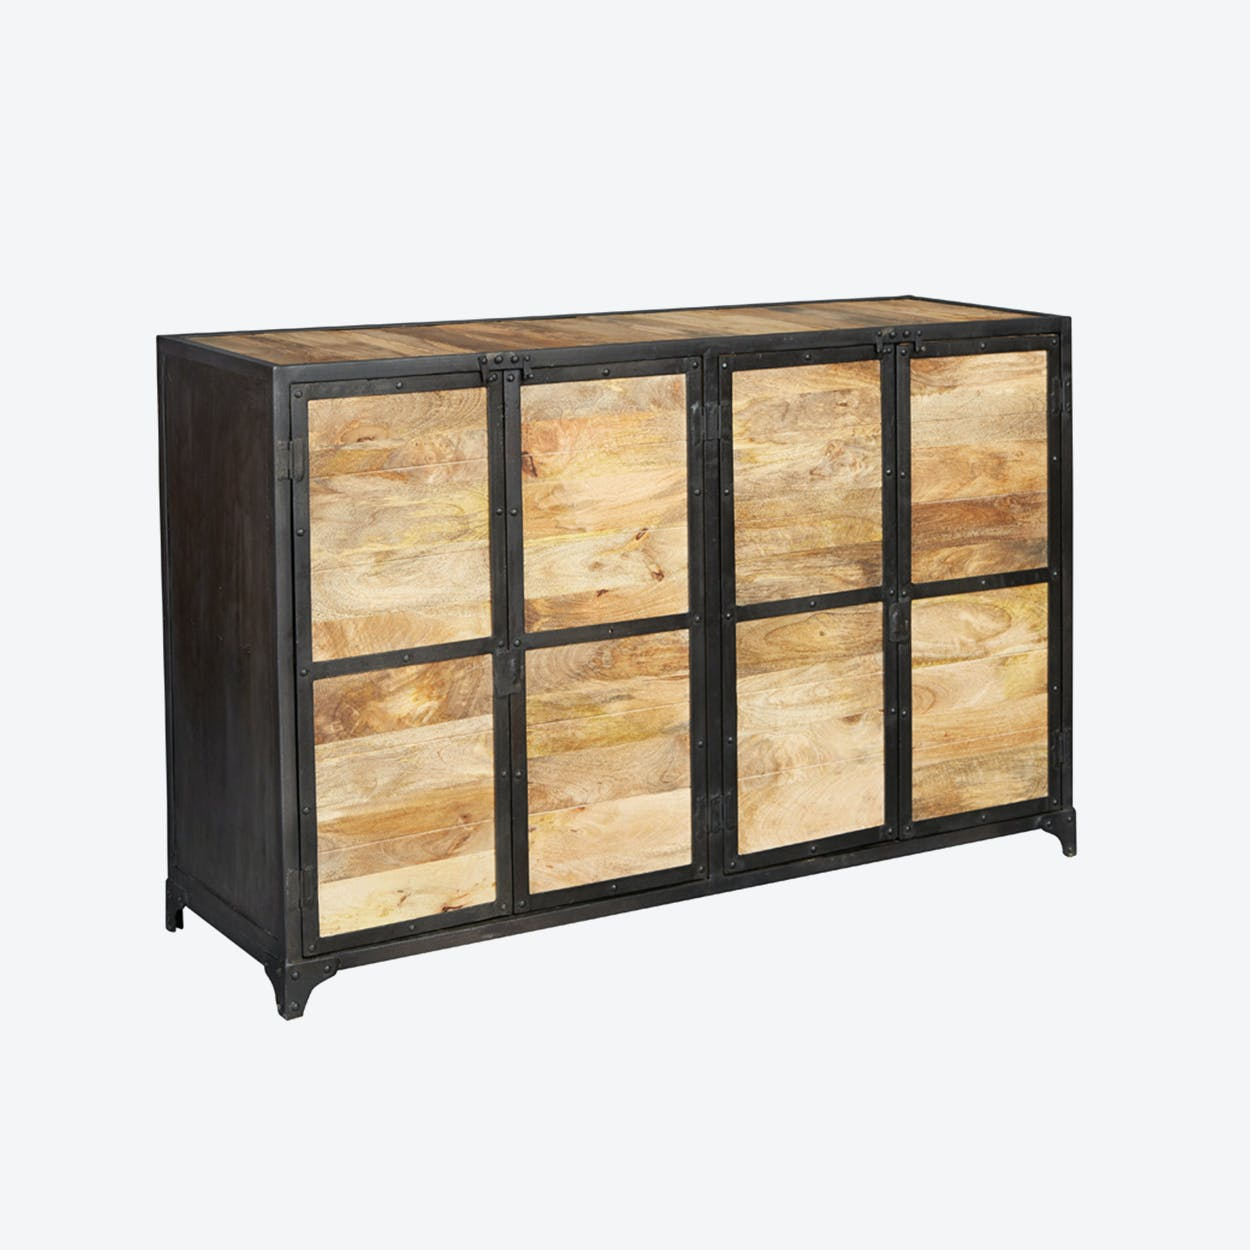 Reclaimed Wood Large Sideboard